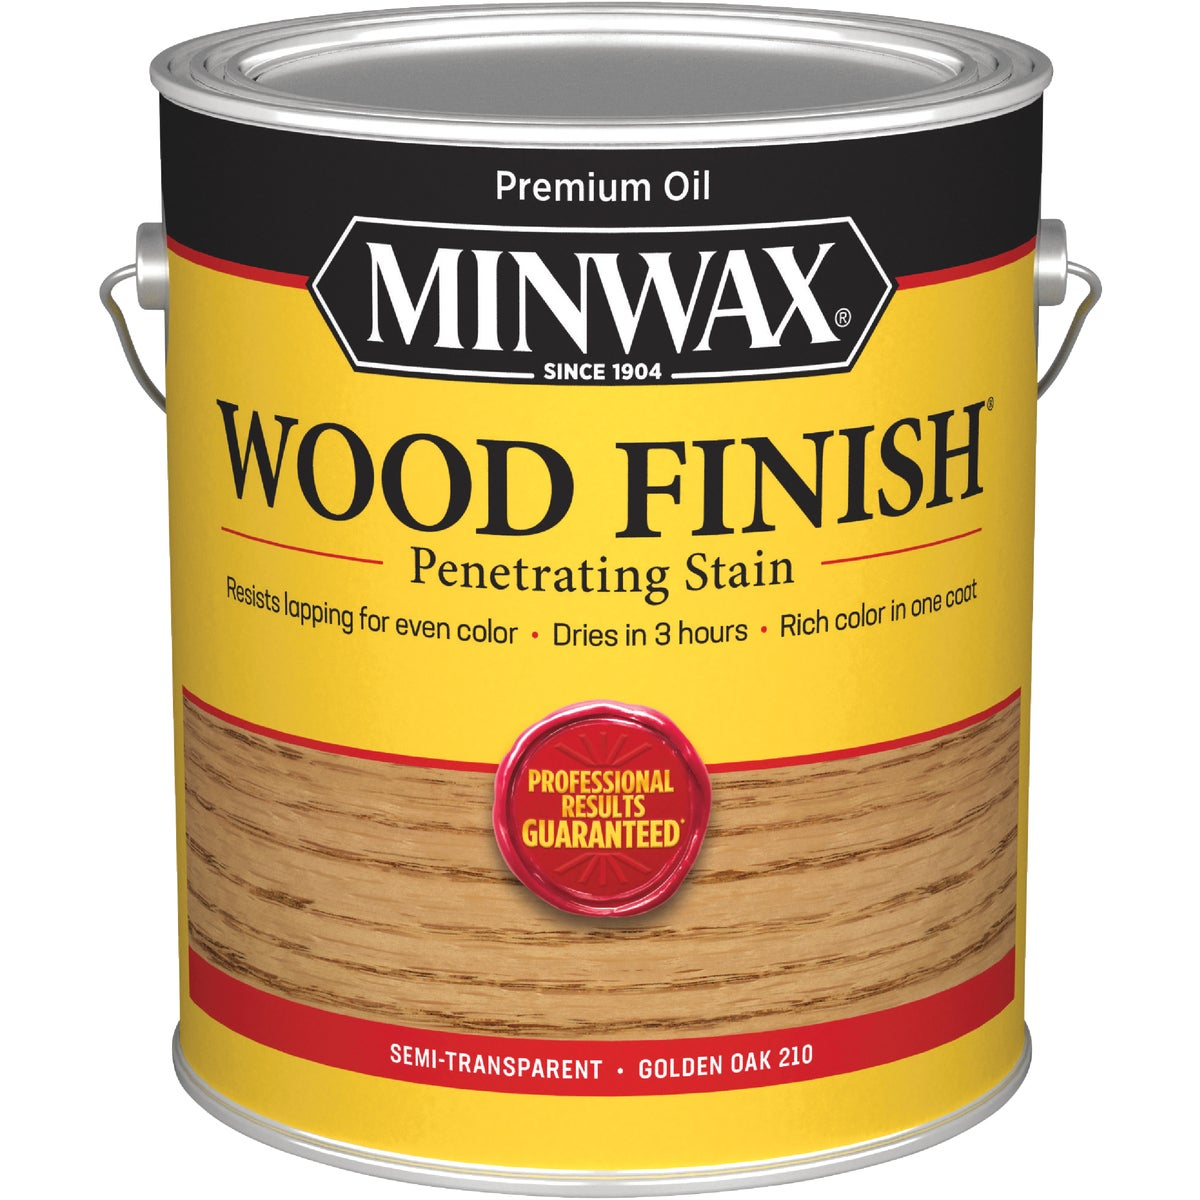 VOC GOLDN OAK WOOD STAIN - 71071000 by Minwax Company